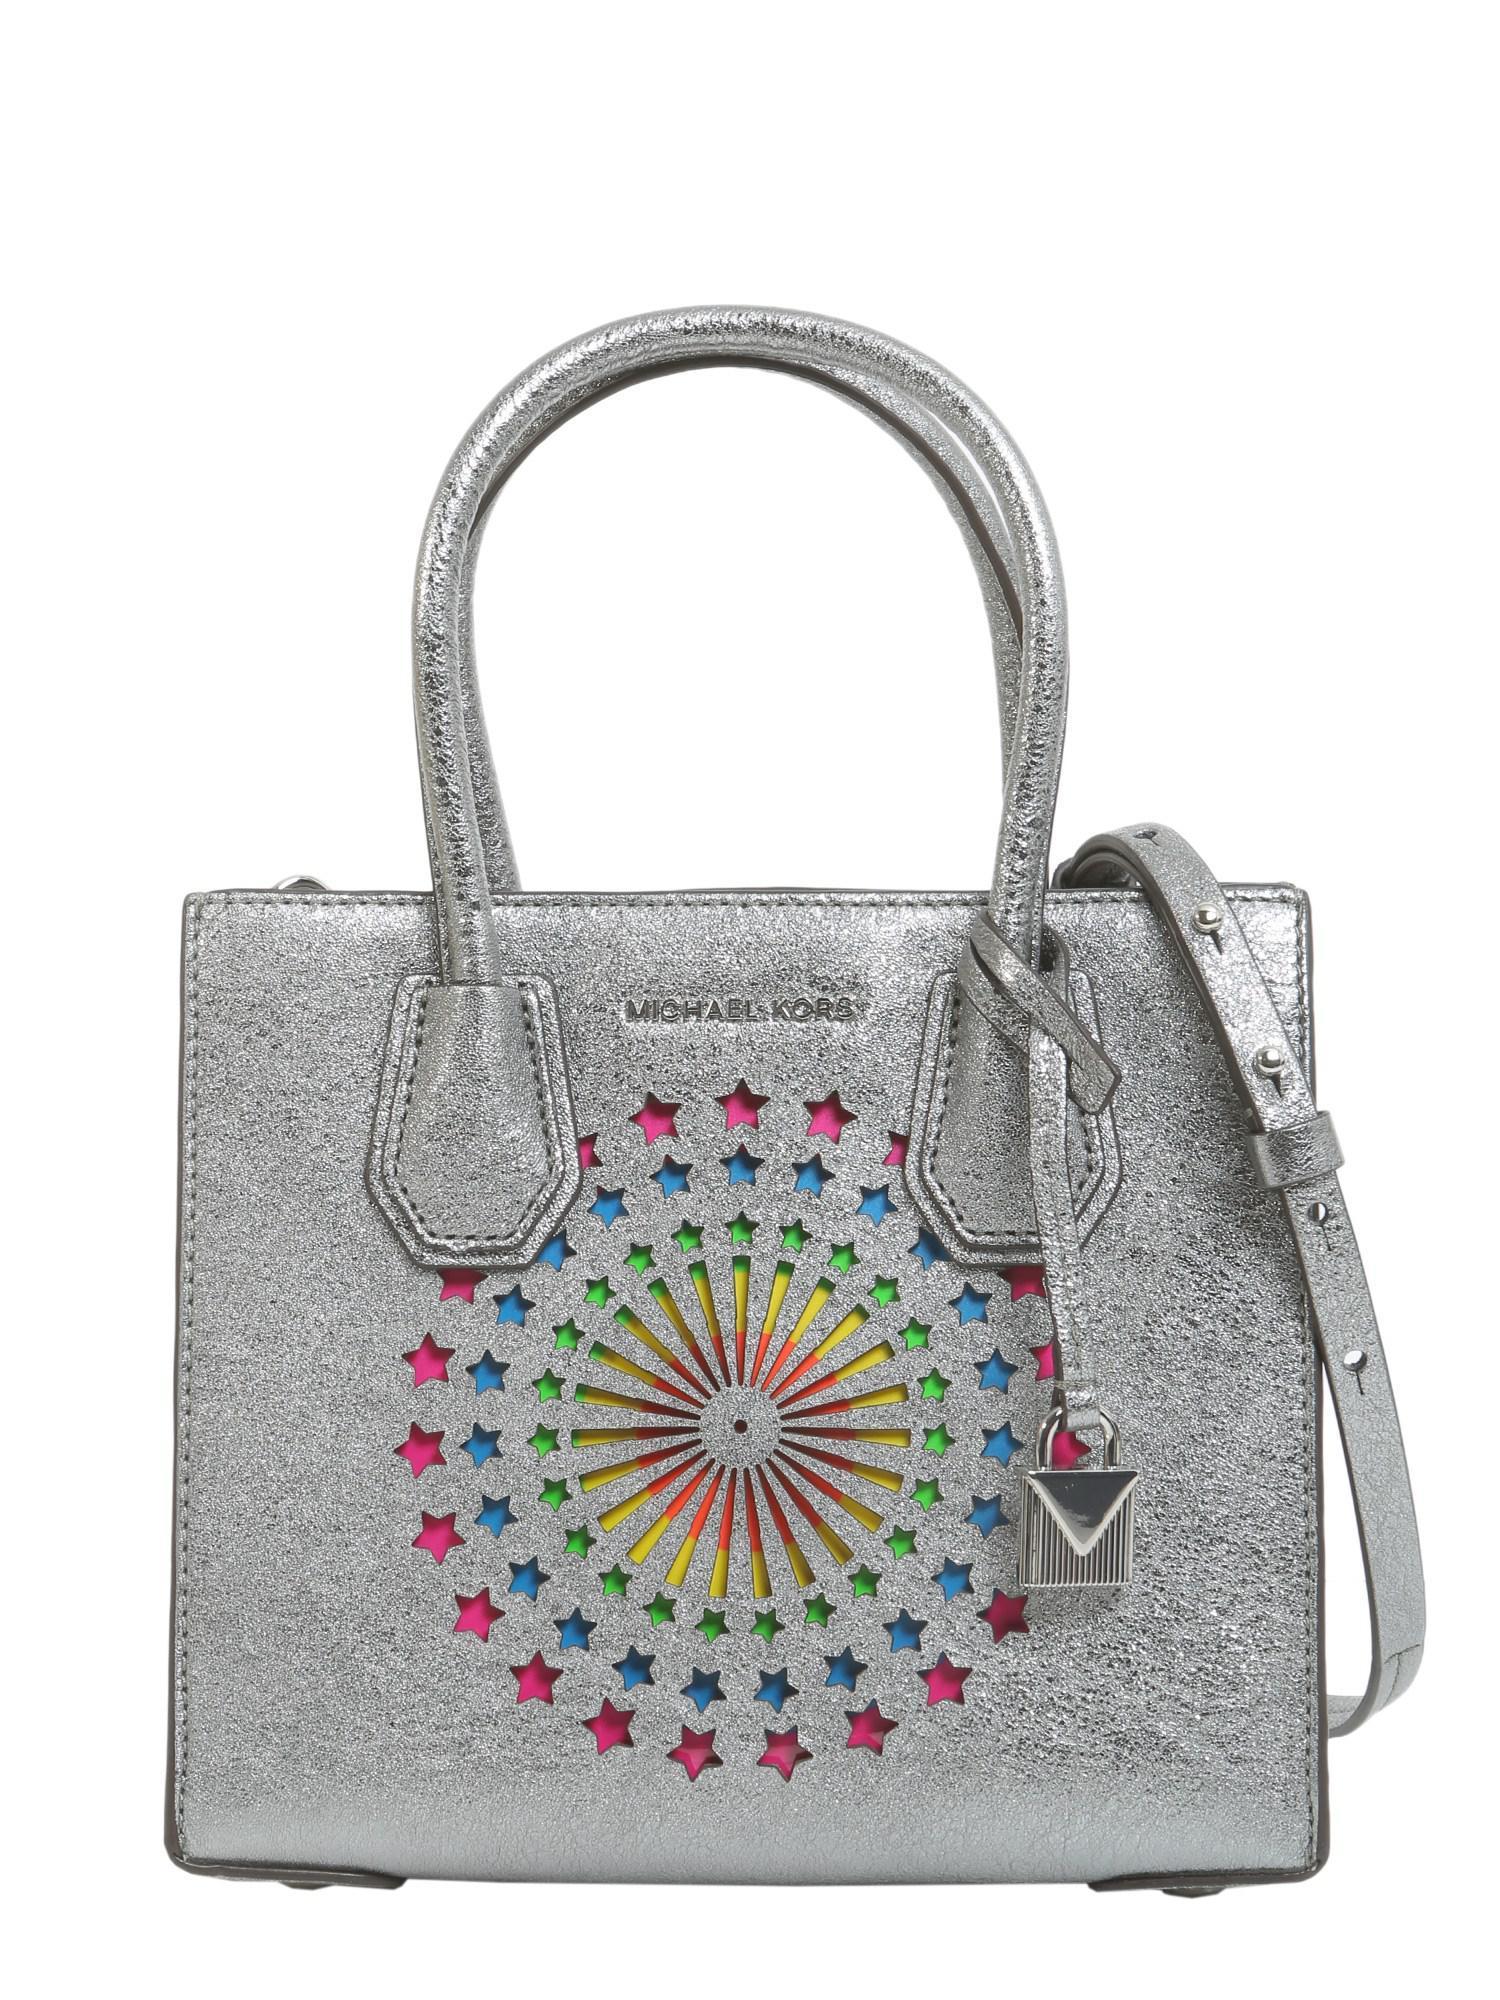 c82c79f1d151e Lyst - MICHAEL Michael Kors Mercer Modern Disco Leathe Bag in Metallic